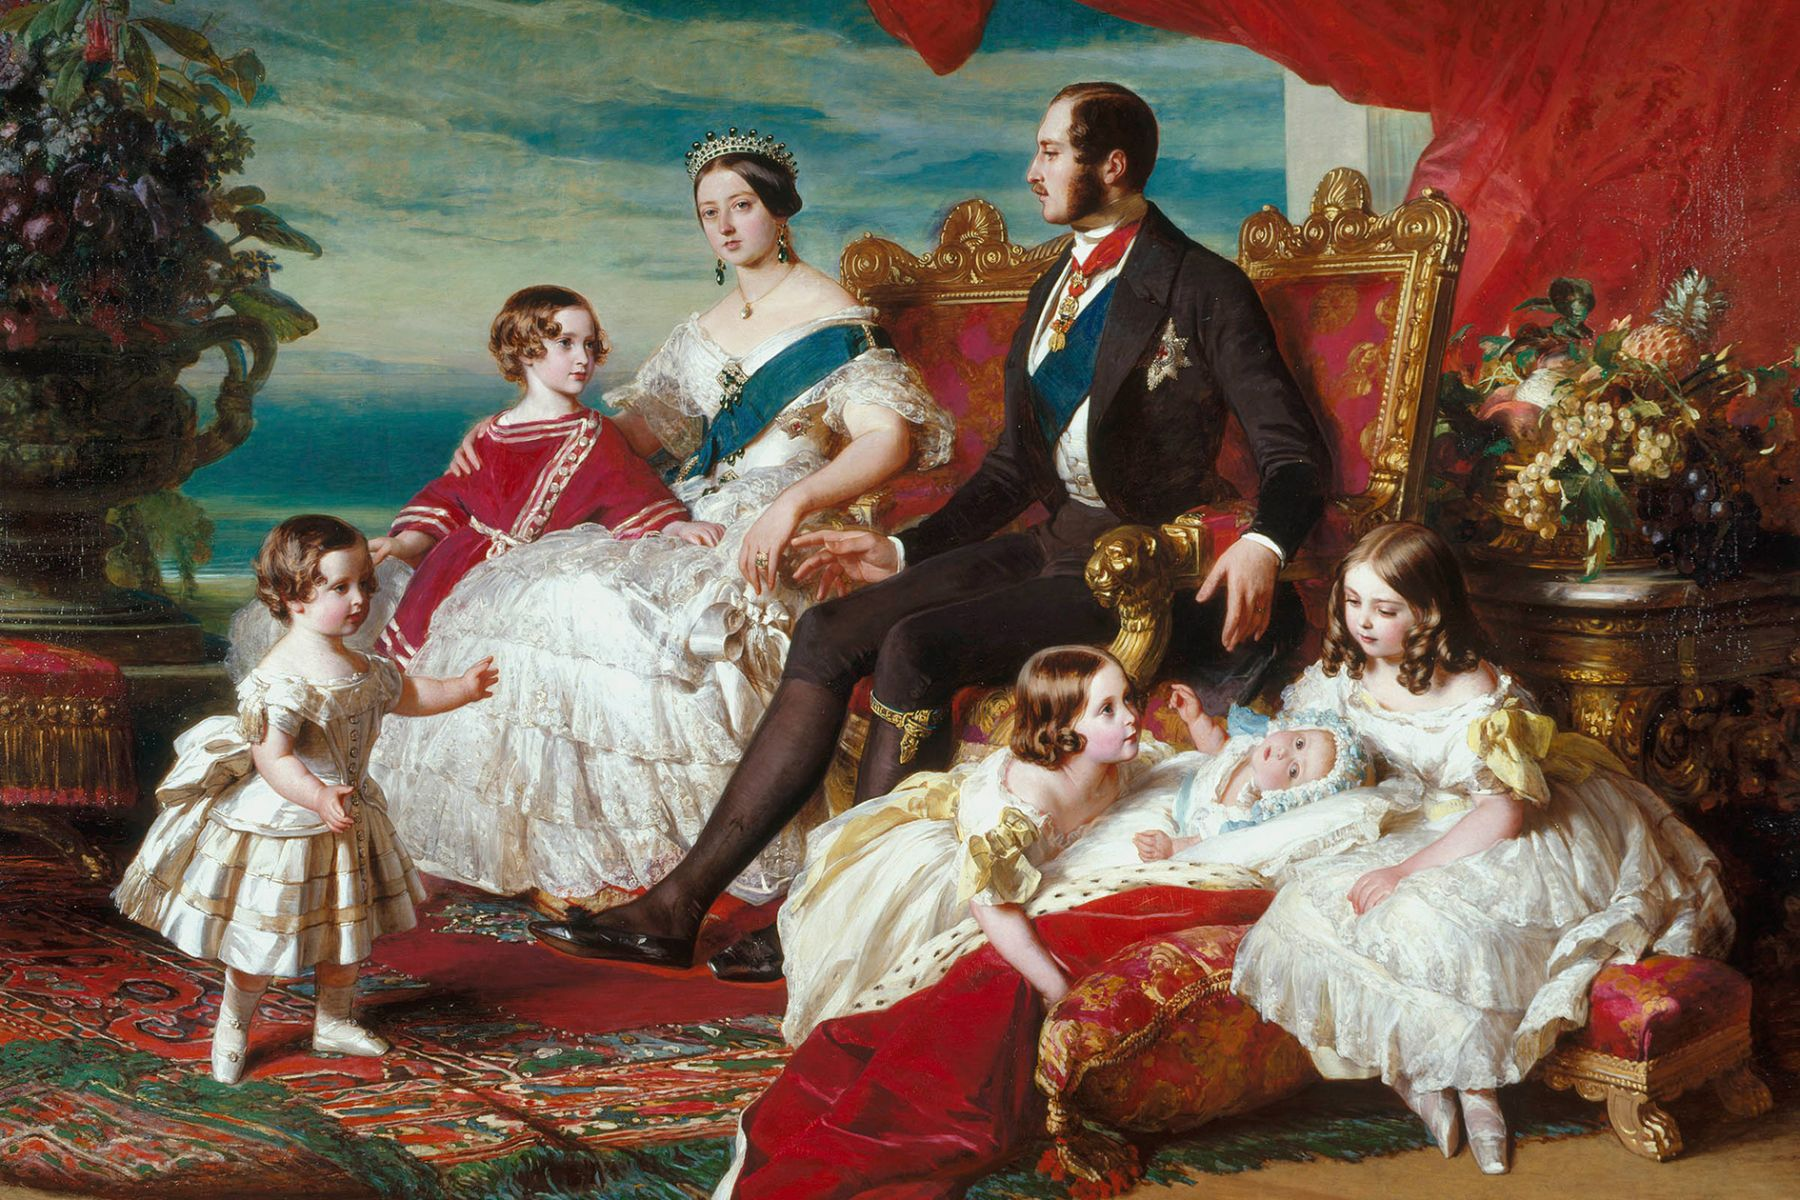 pravidla viktoriánské éry